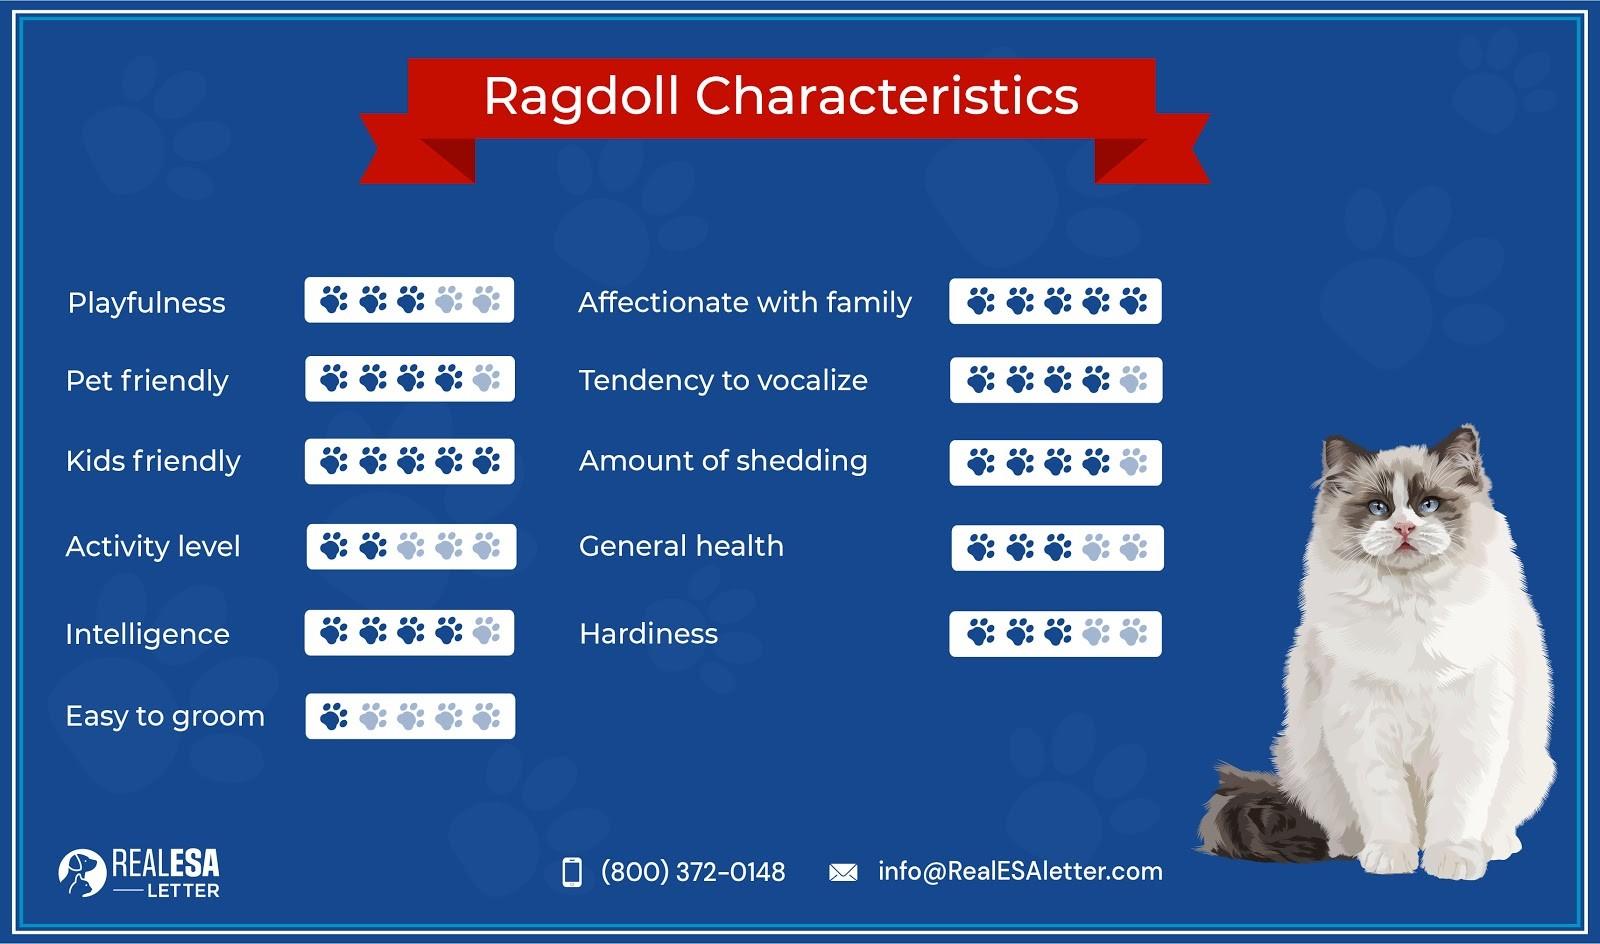 Ragdoll Cat Characteristics